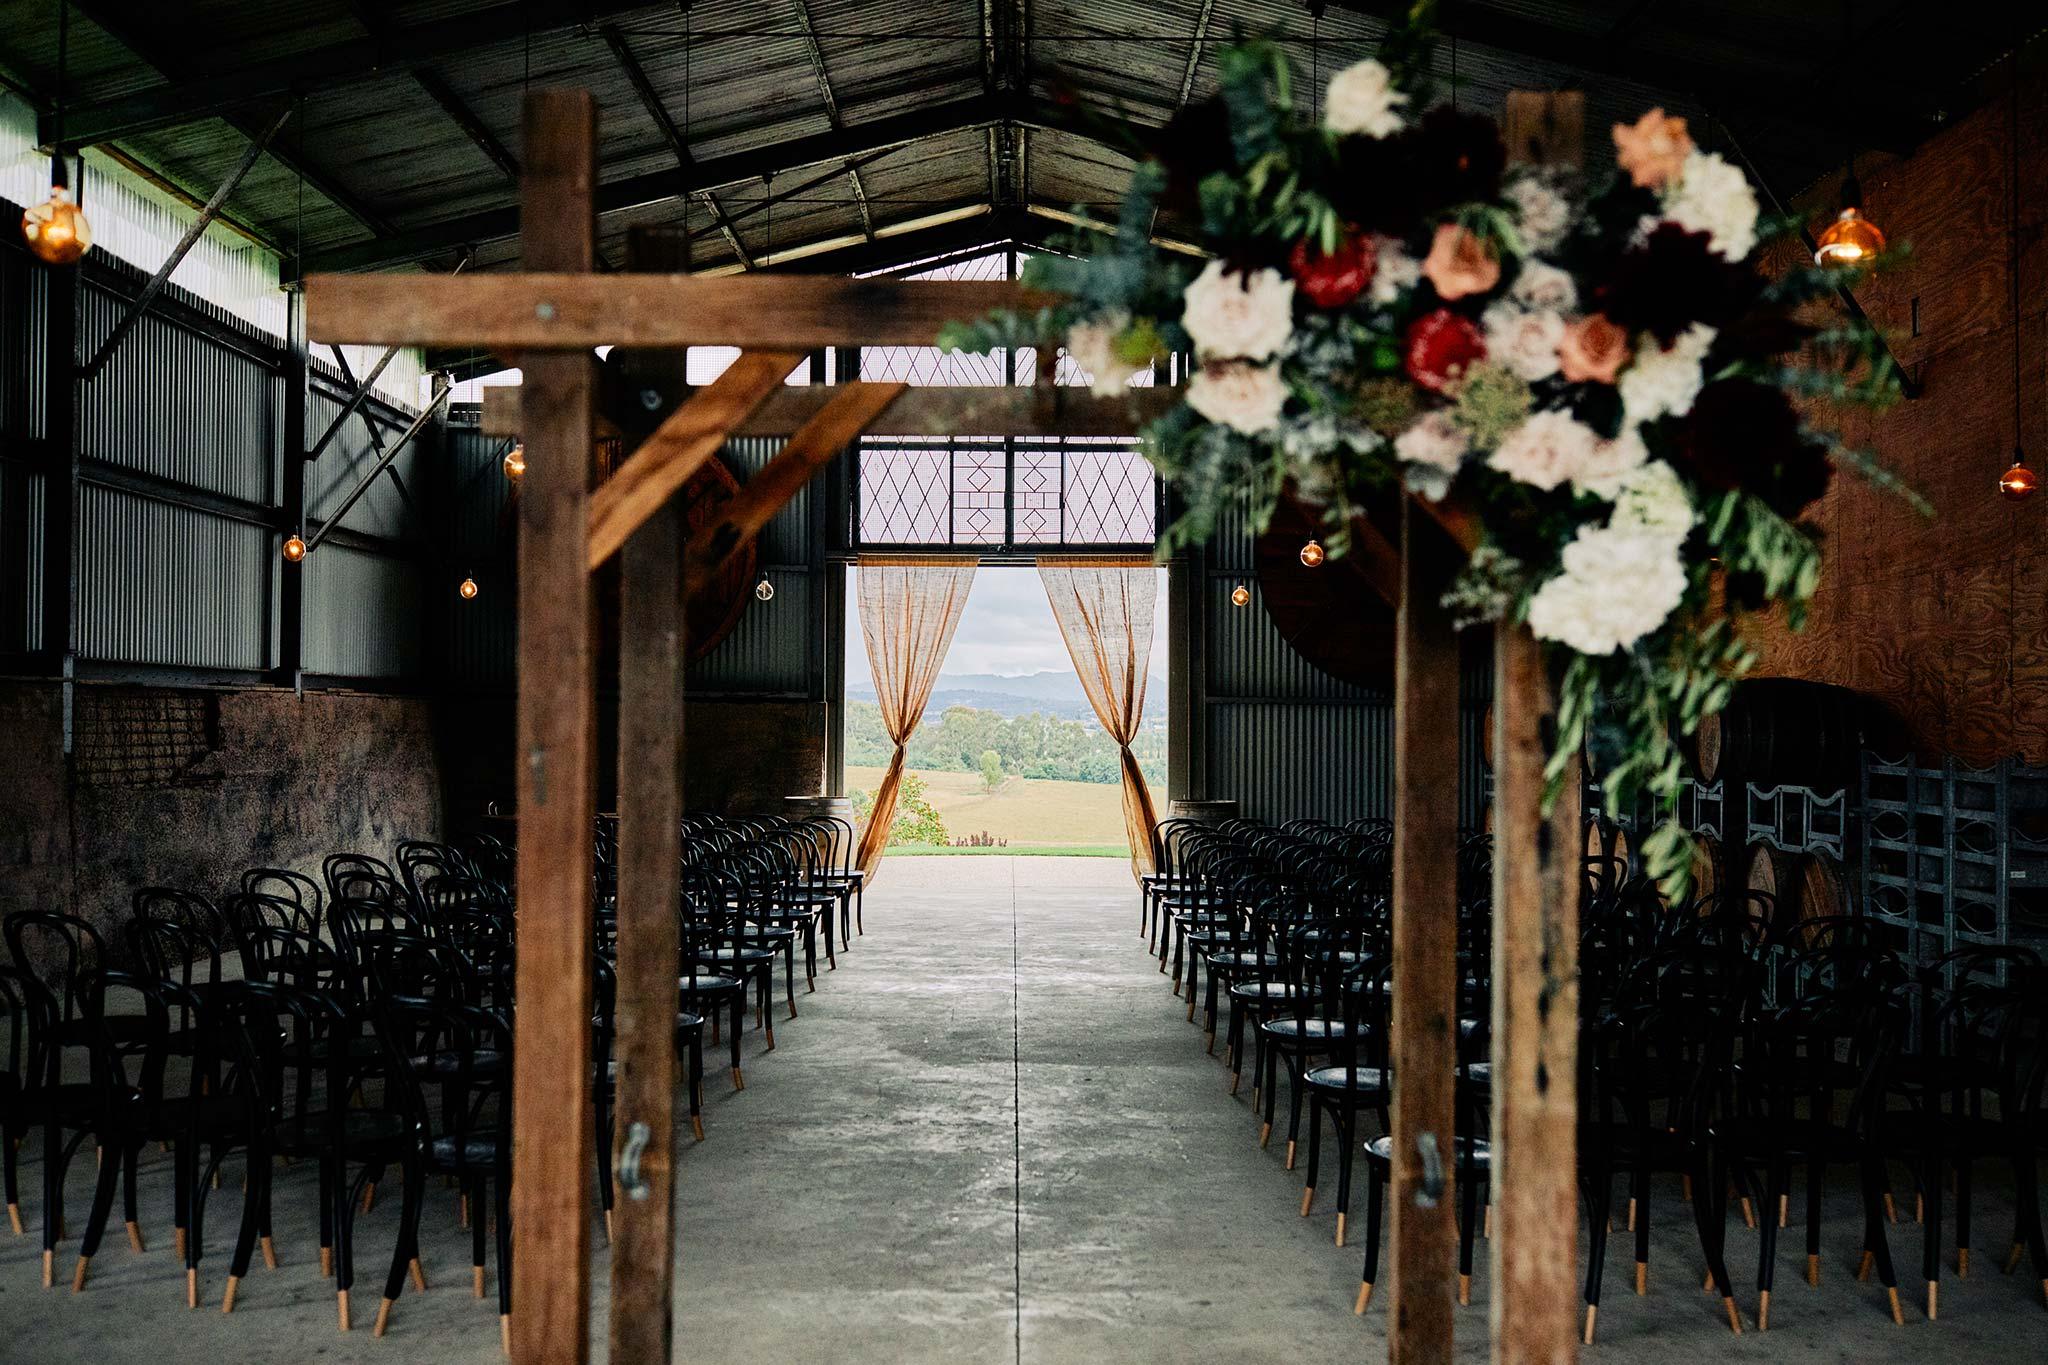 Zonzo estate wedding ceremony decoration